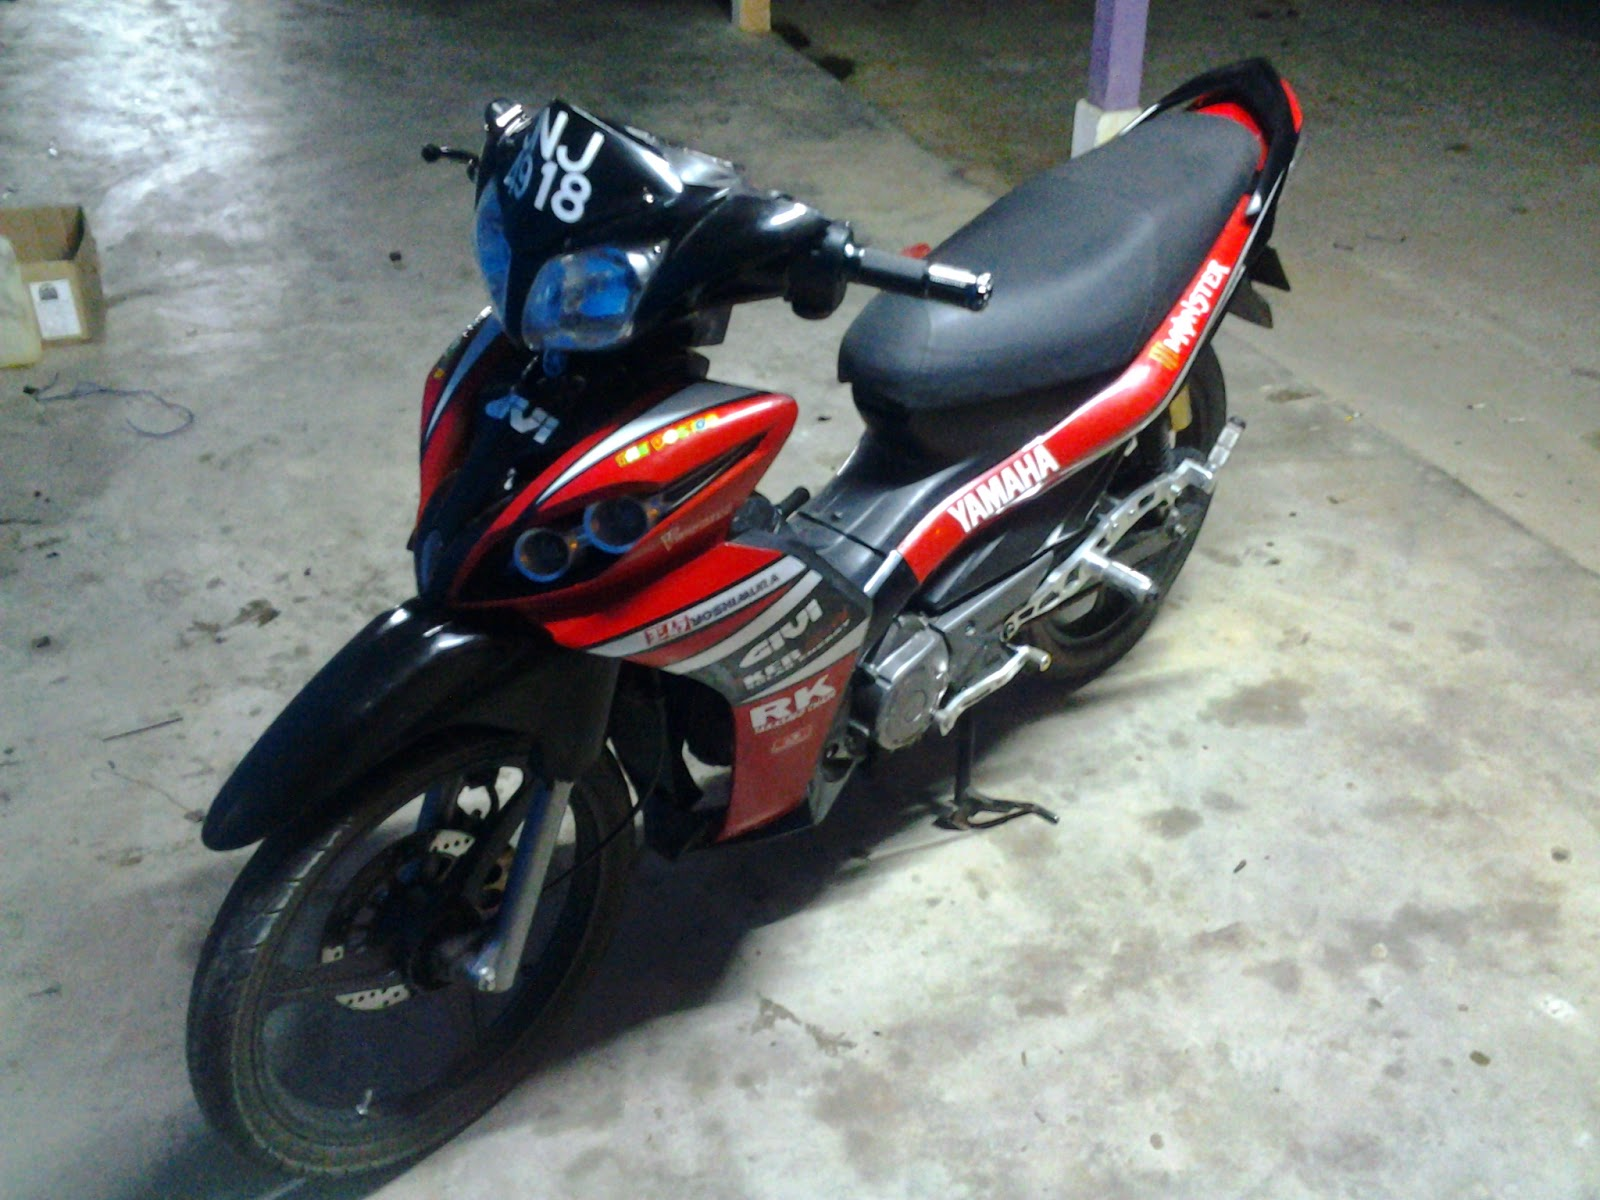 Tuned By Alang Motor Yamaha Lagenda 115zr Cam Merah In Action